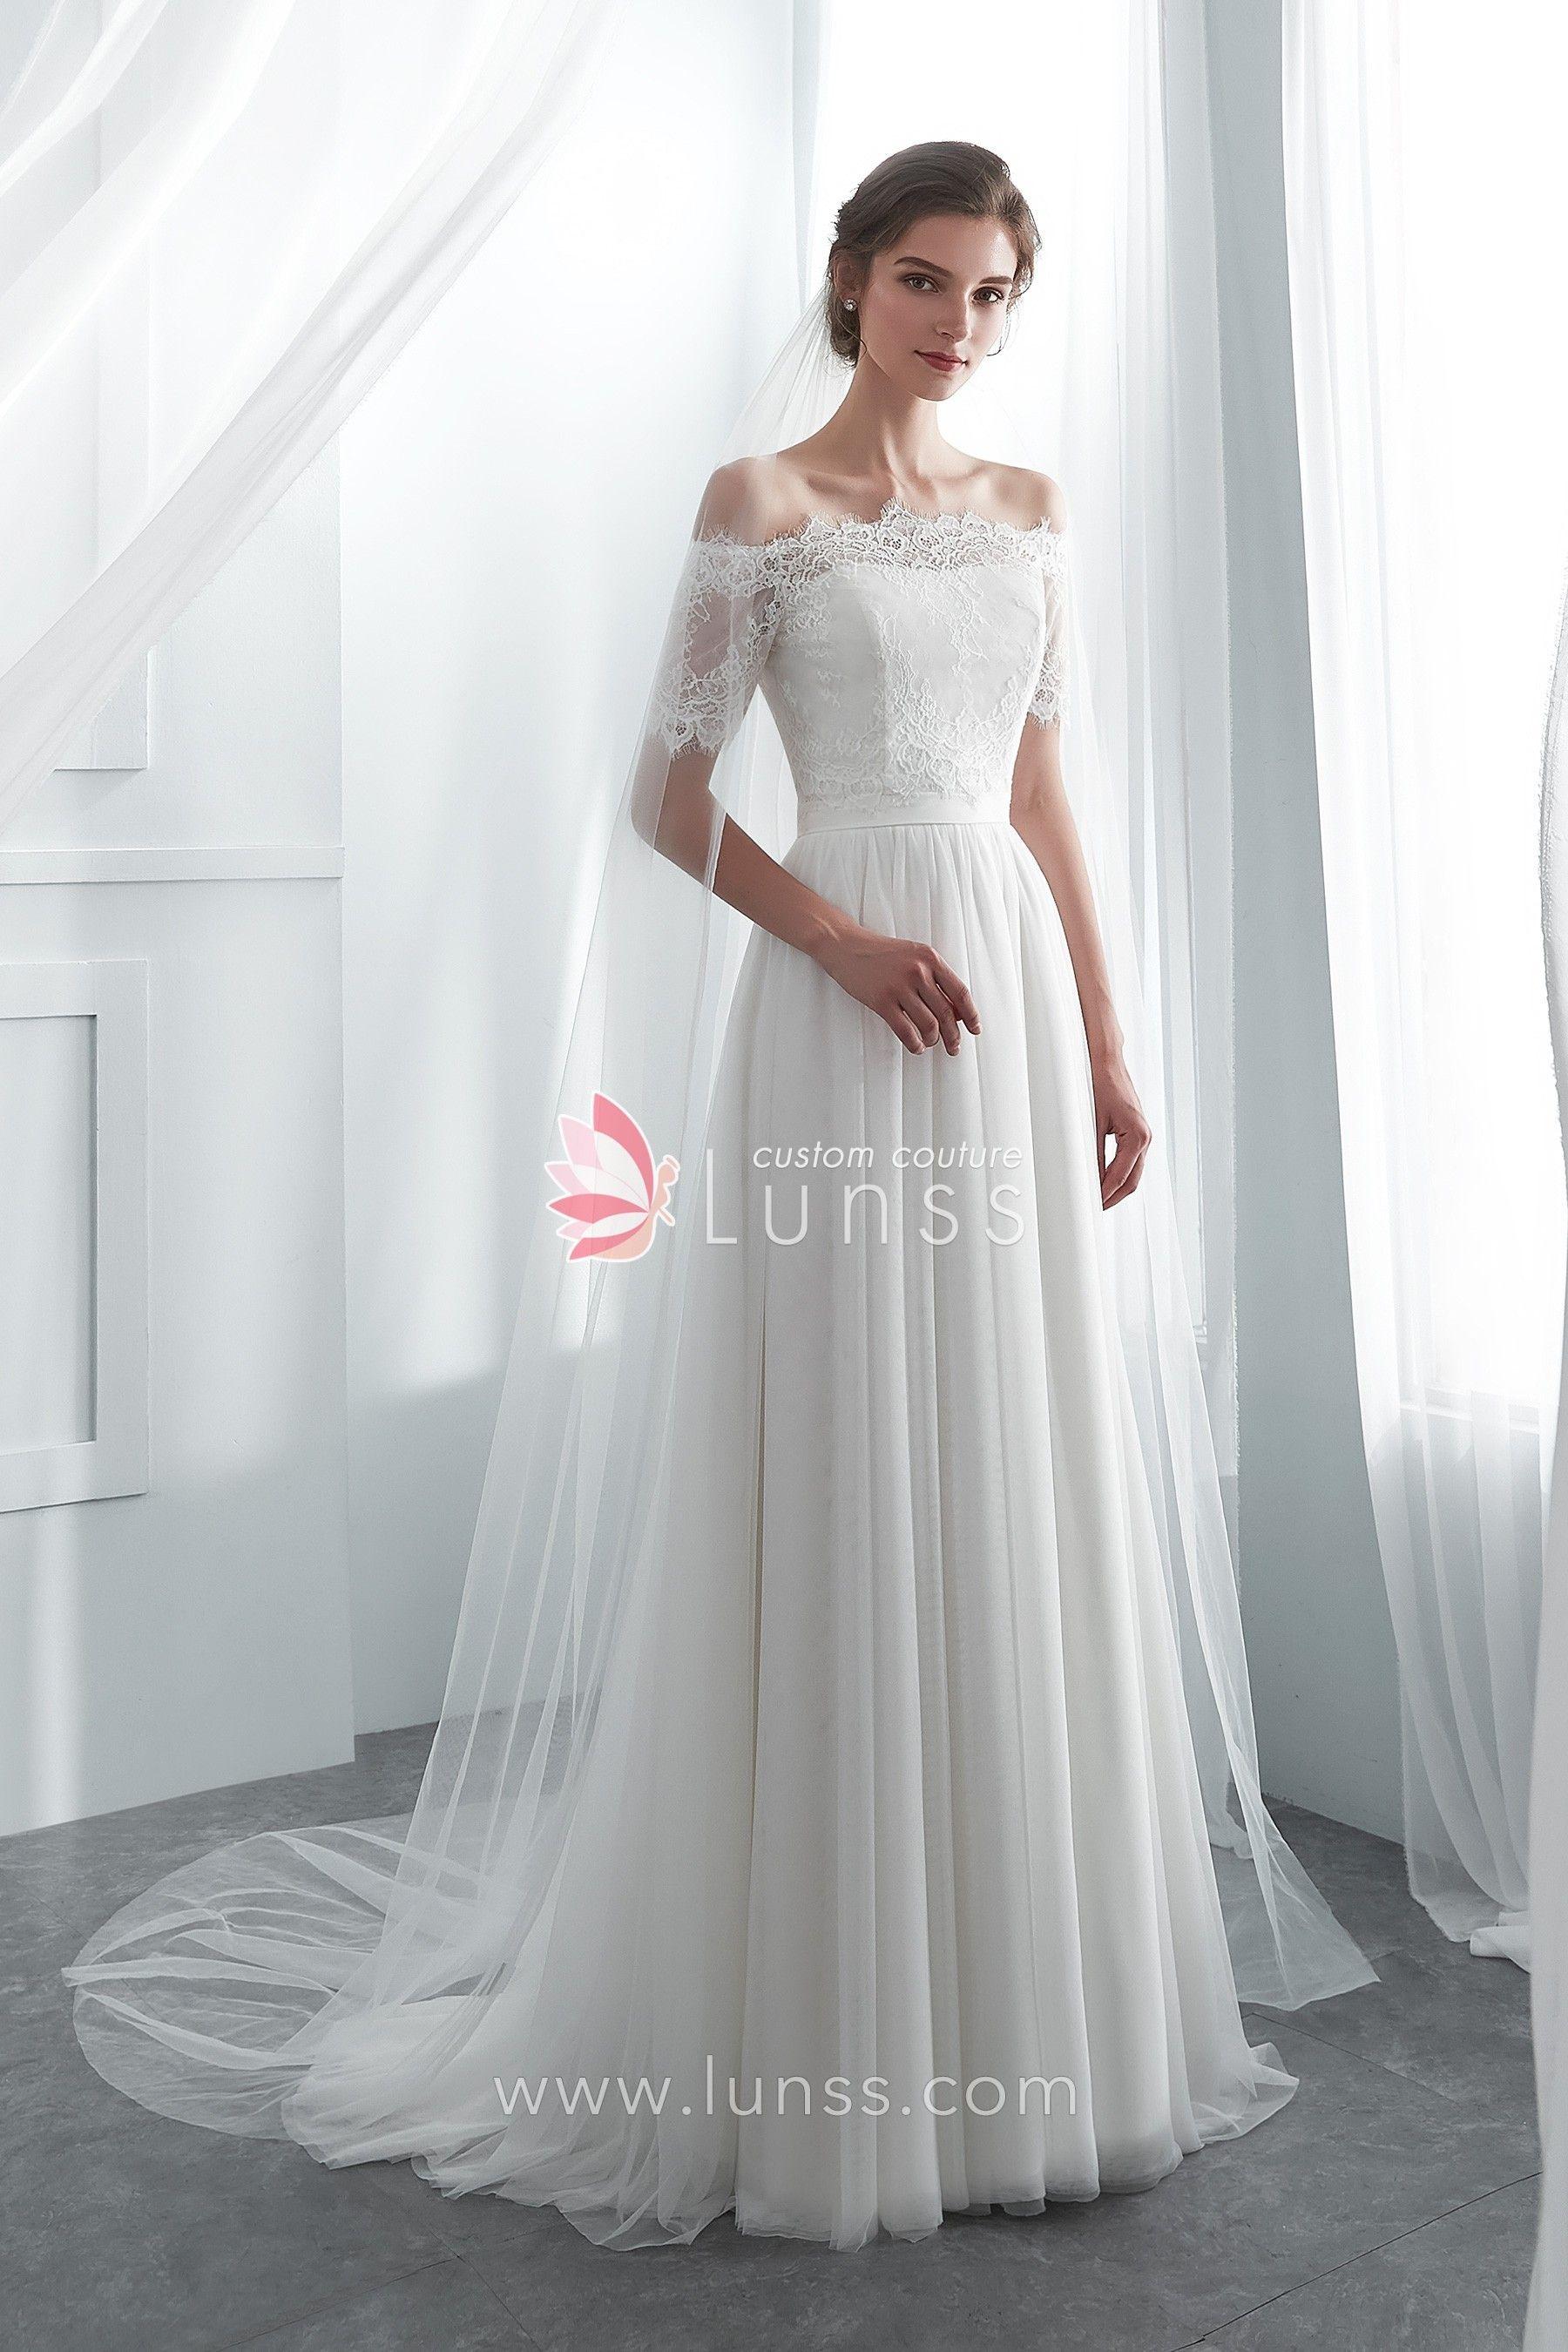 db8f7e18ca584 Ivory Simple Semi-sweetheart Spandex Net Long Wedding Dress with ...